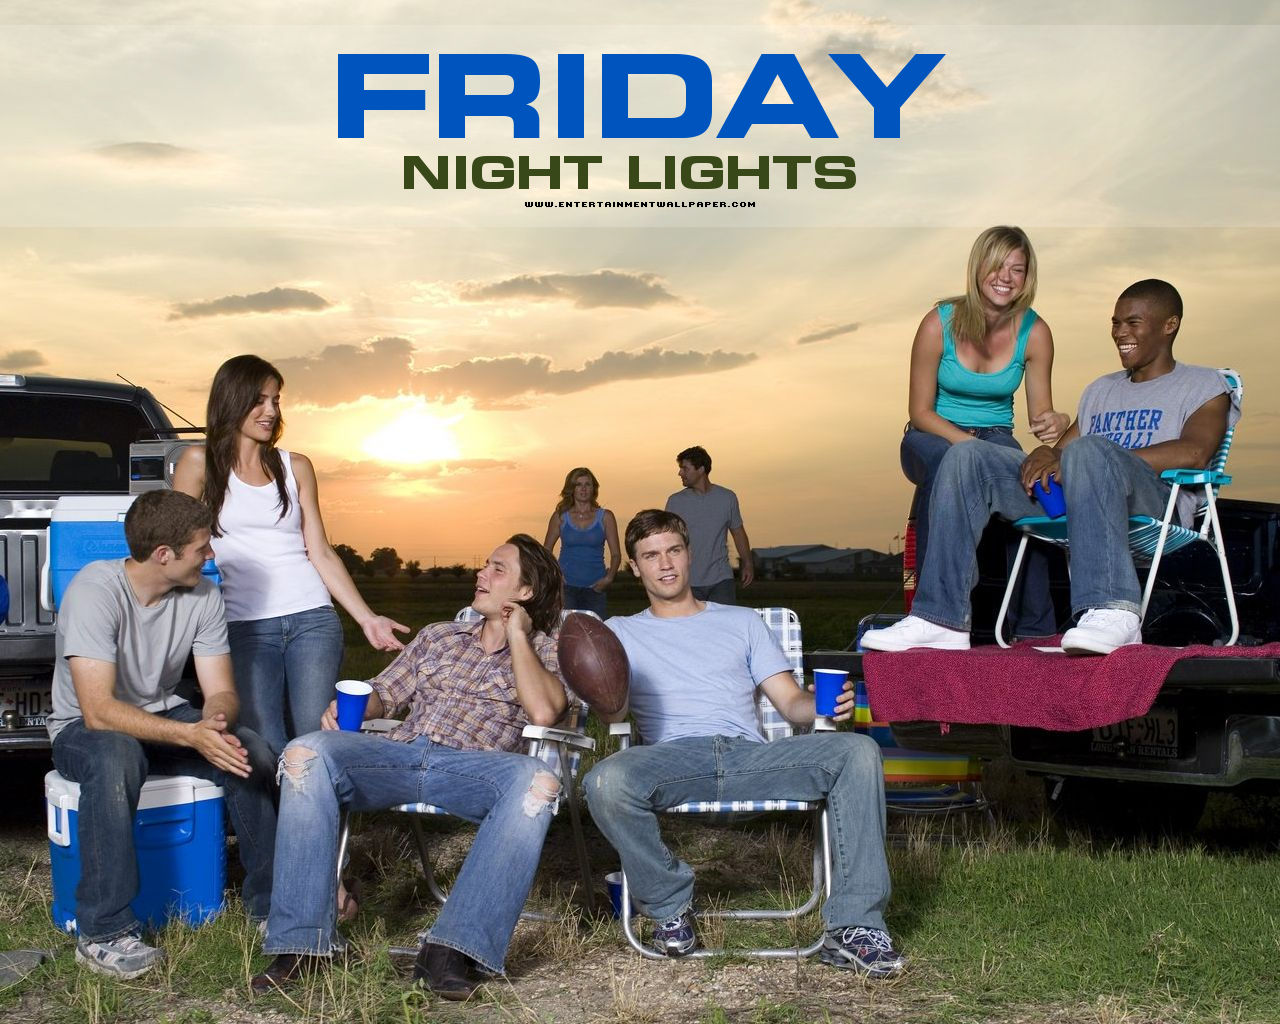 friday night lights wallpaper 1280x1024 17 1280x1024